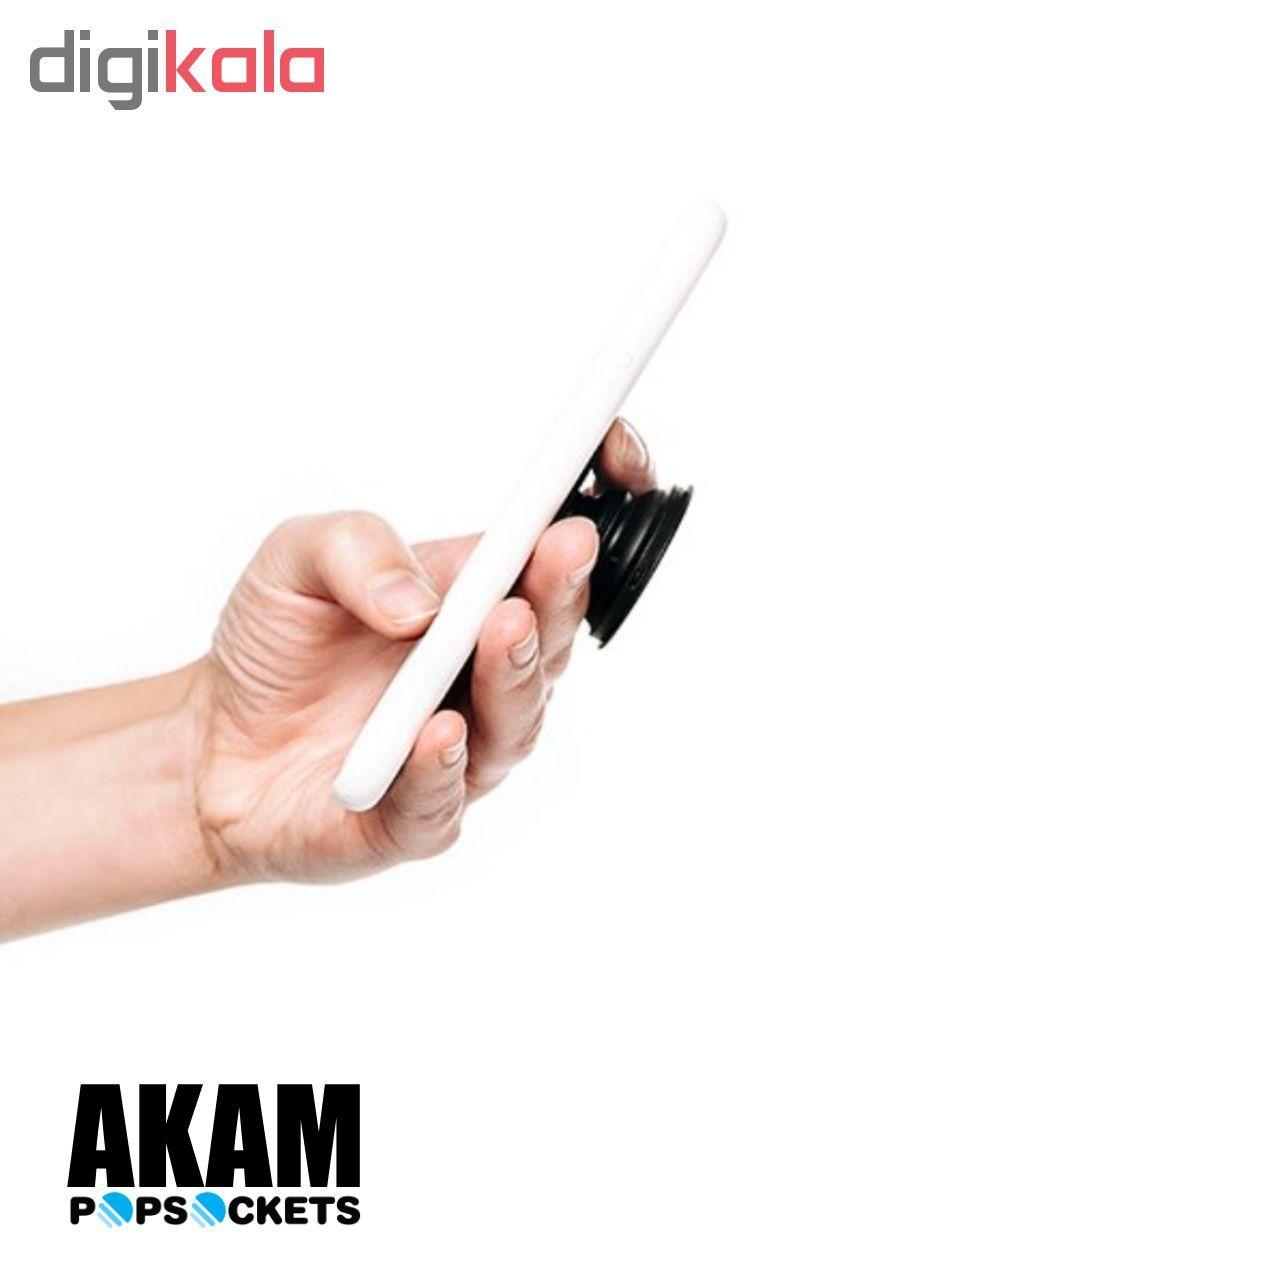 پایه نگهدارنده گوشی موبایل پاپ سوکت آکام مدل APS0061 main 1 9